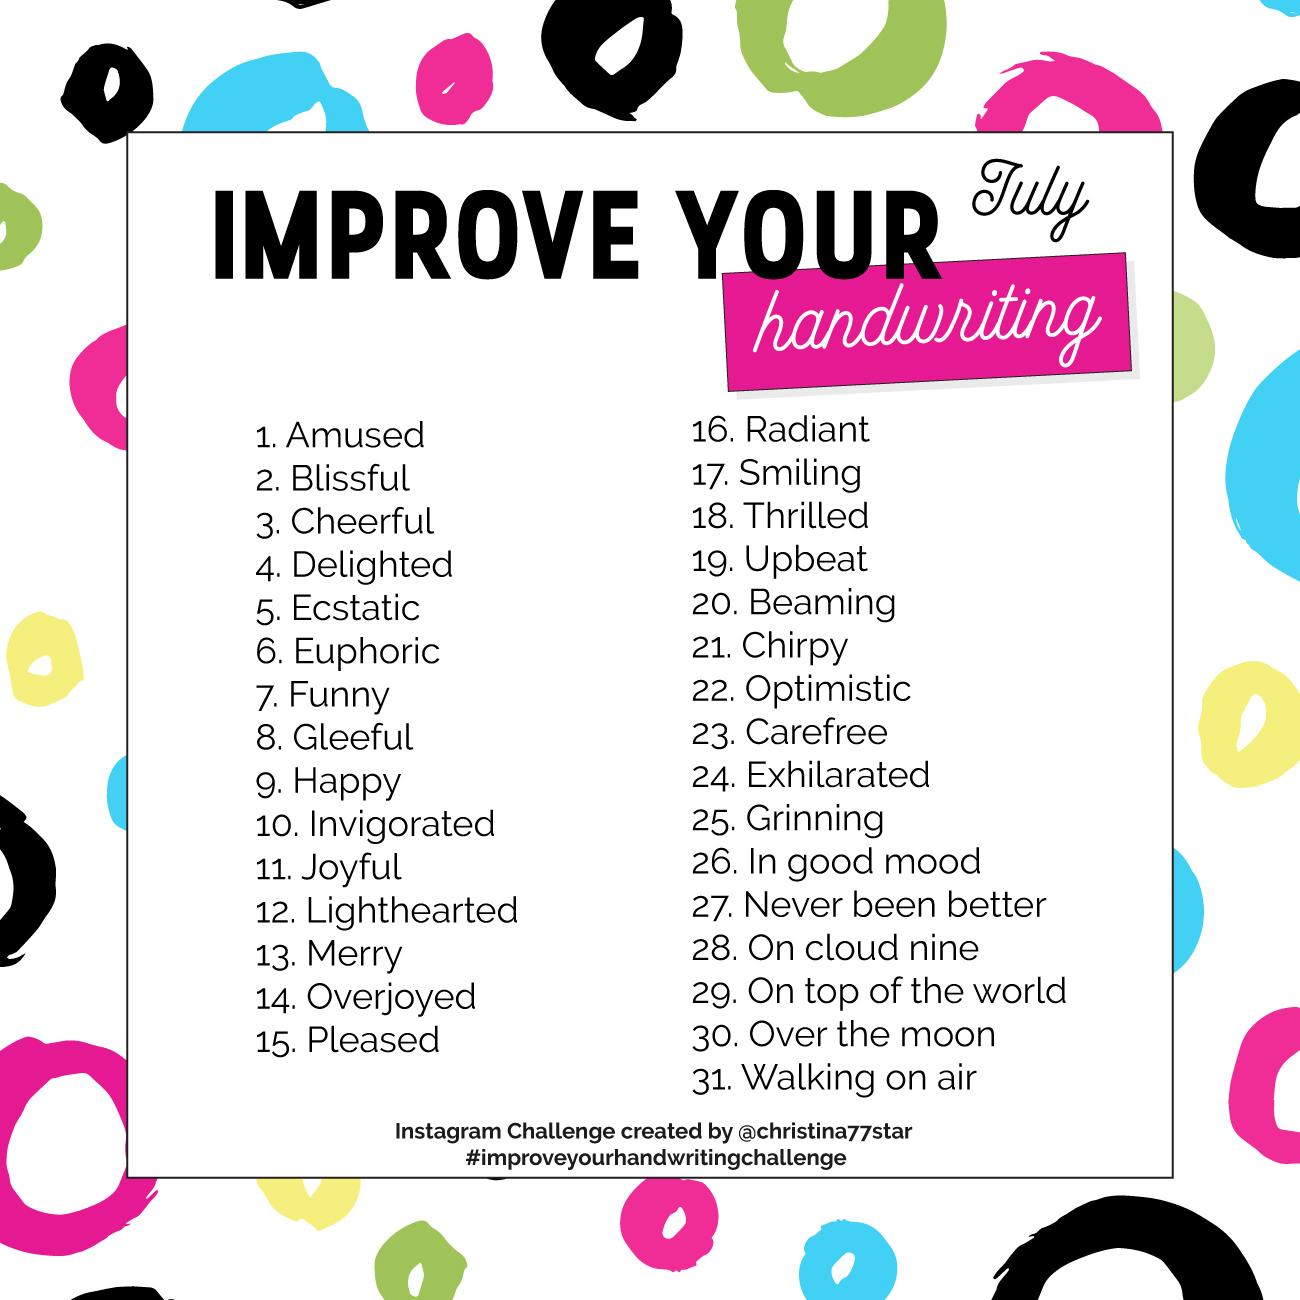 Improve Your Handwriting Instagram Challenge - July